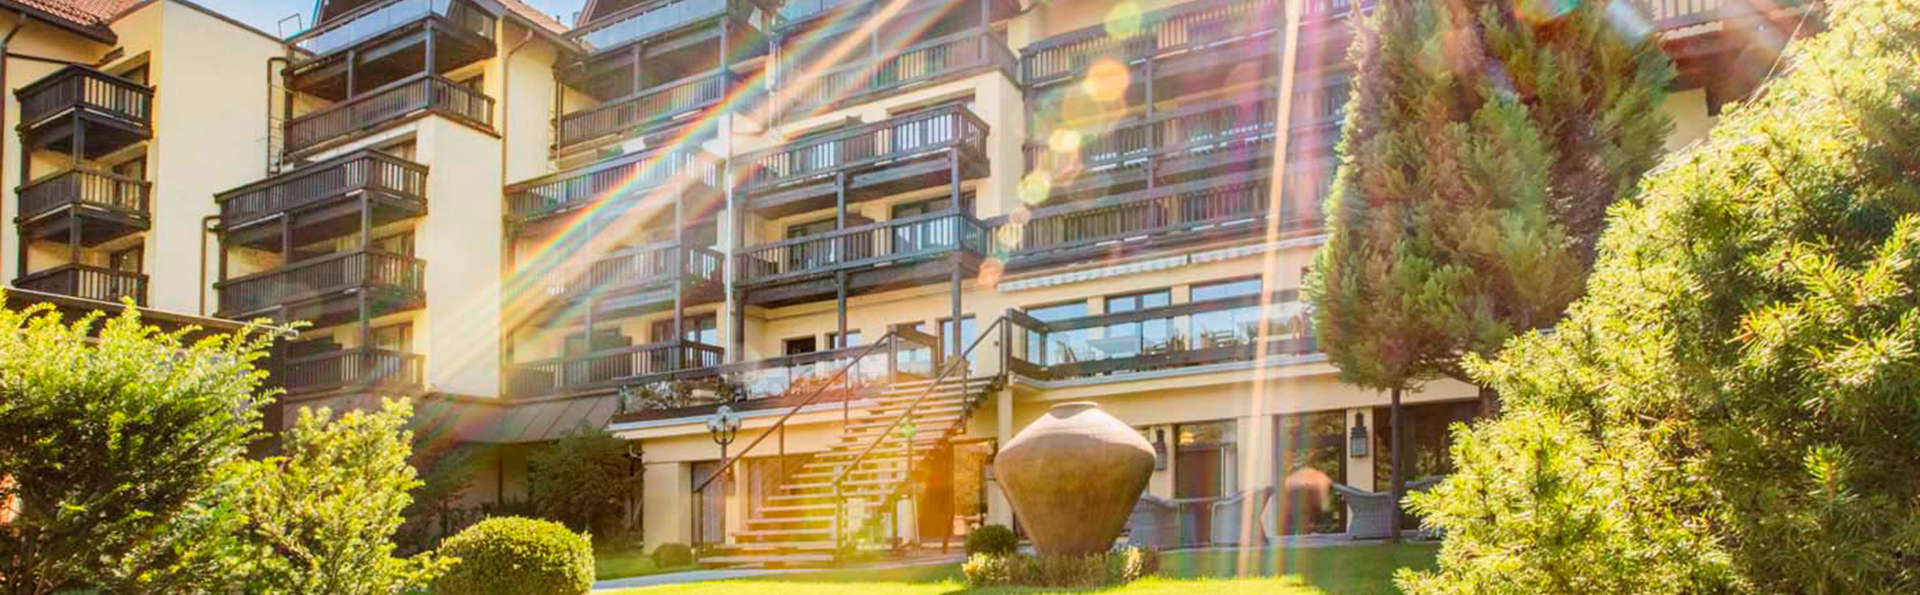 Parkhotel Luise Bad Herrenalb - EDIT_NEW_front1.jpg